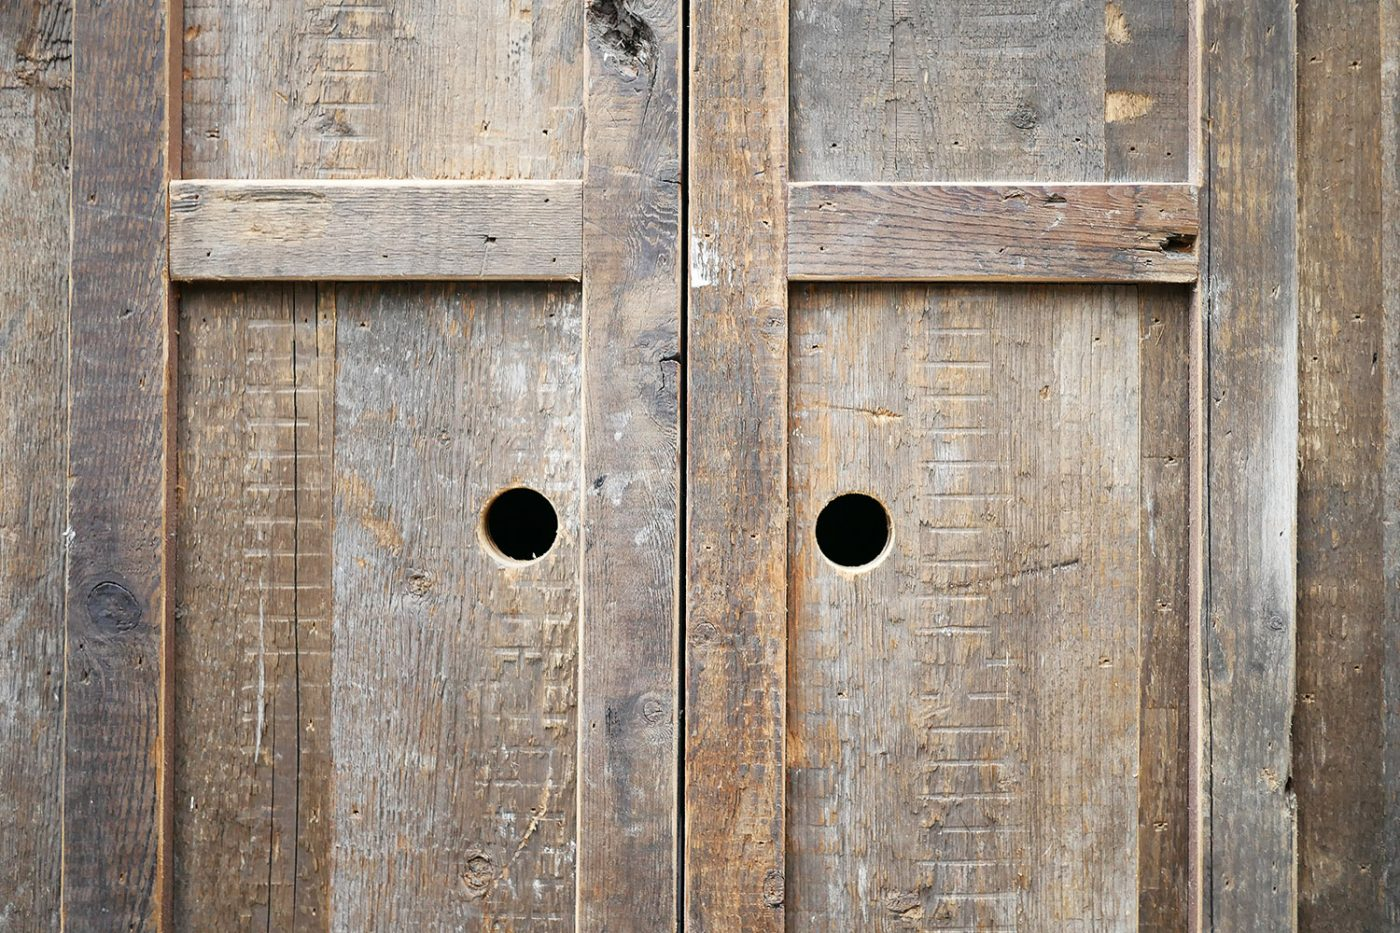 Mam_Restaurant_bar_Design_details_interior_details_wooden_door_antique_vintage